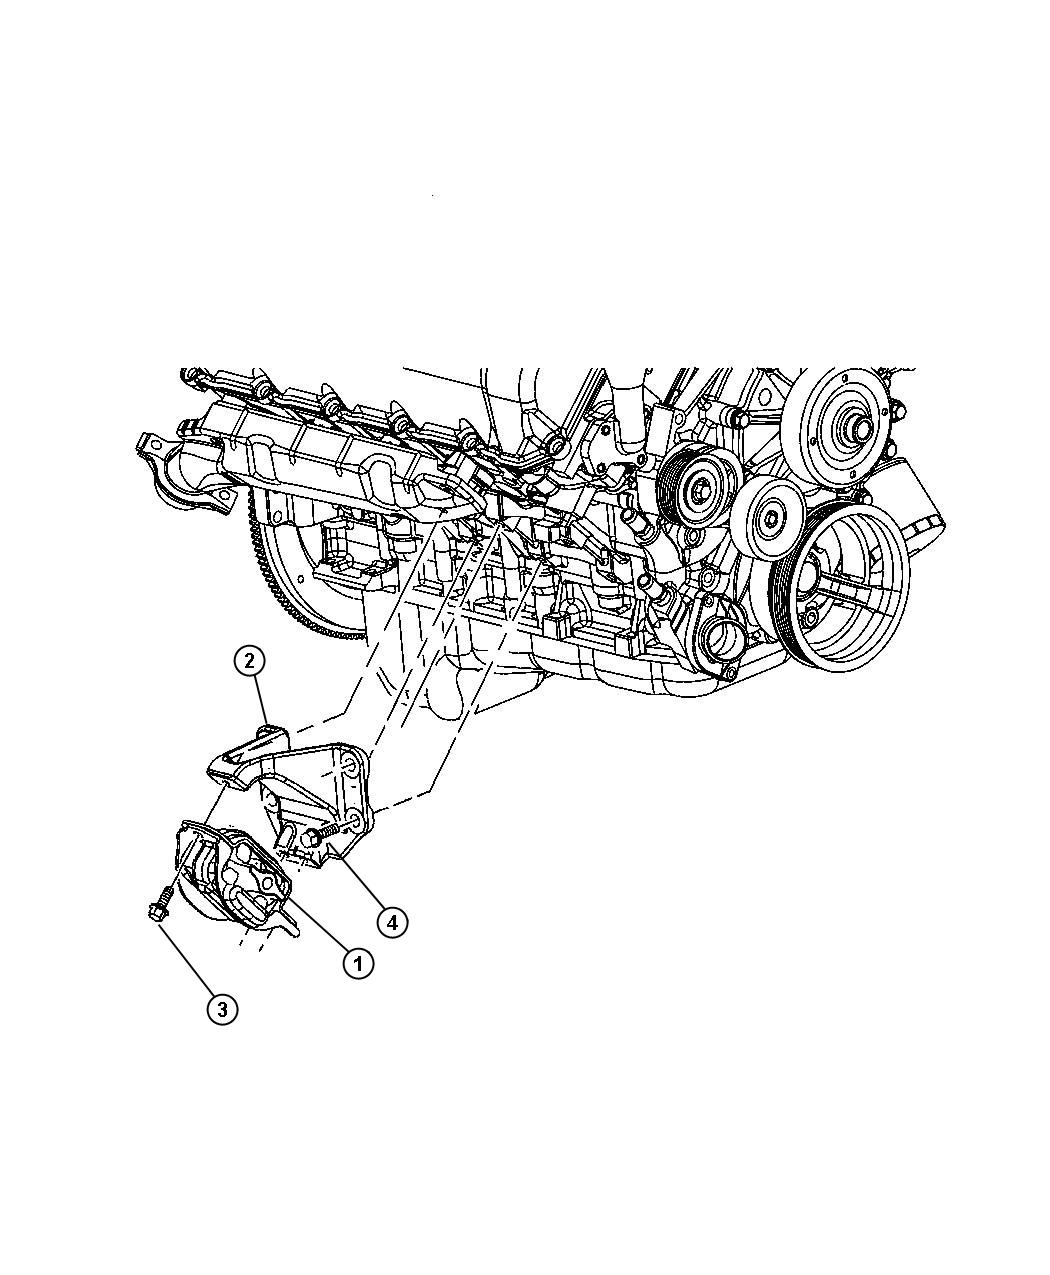 Honda Civic Instrument Cluster Also 2005 Honda Civic Wiring Diagram